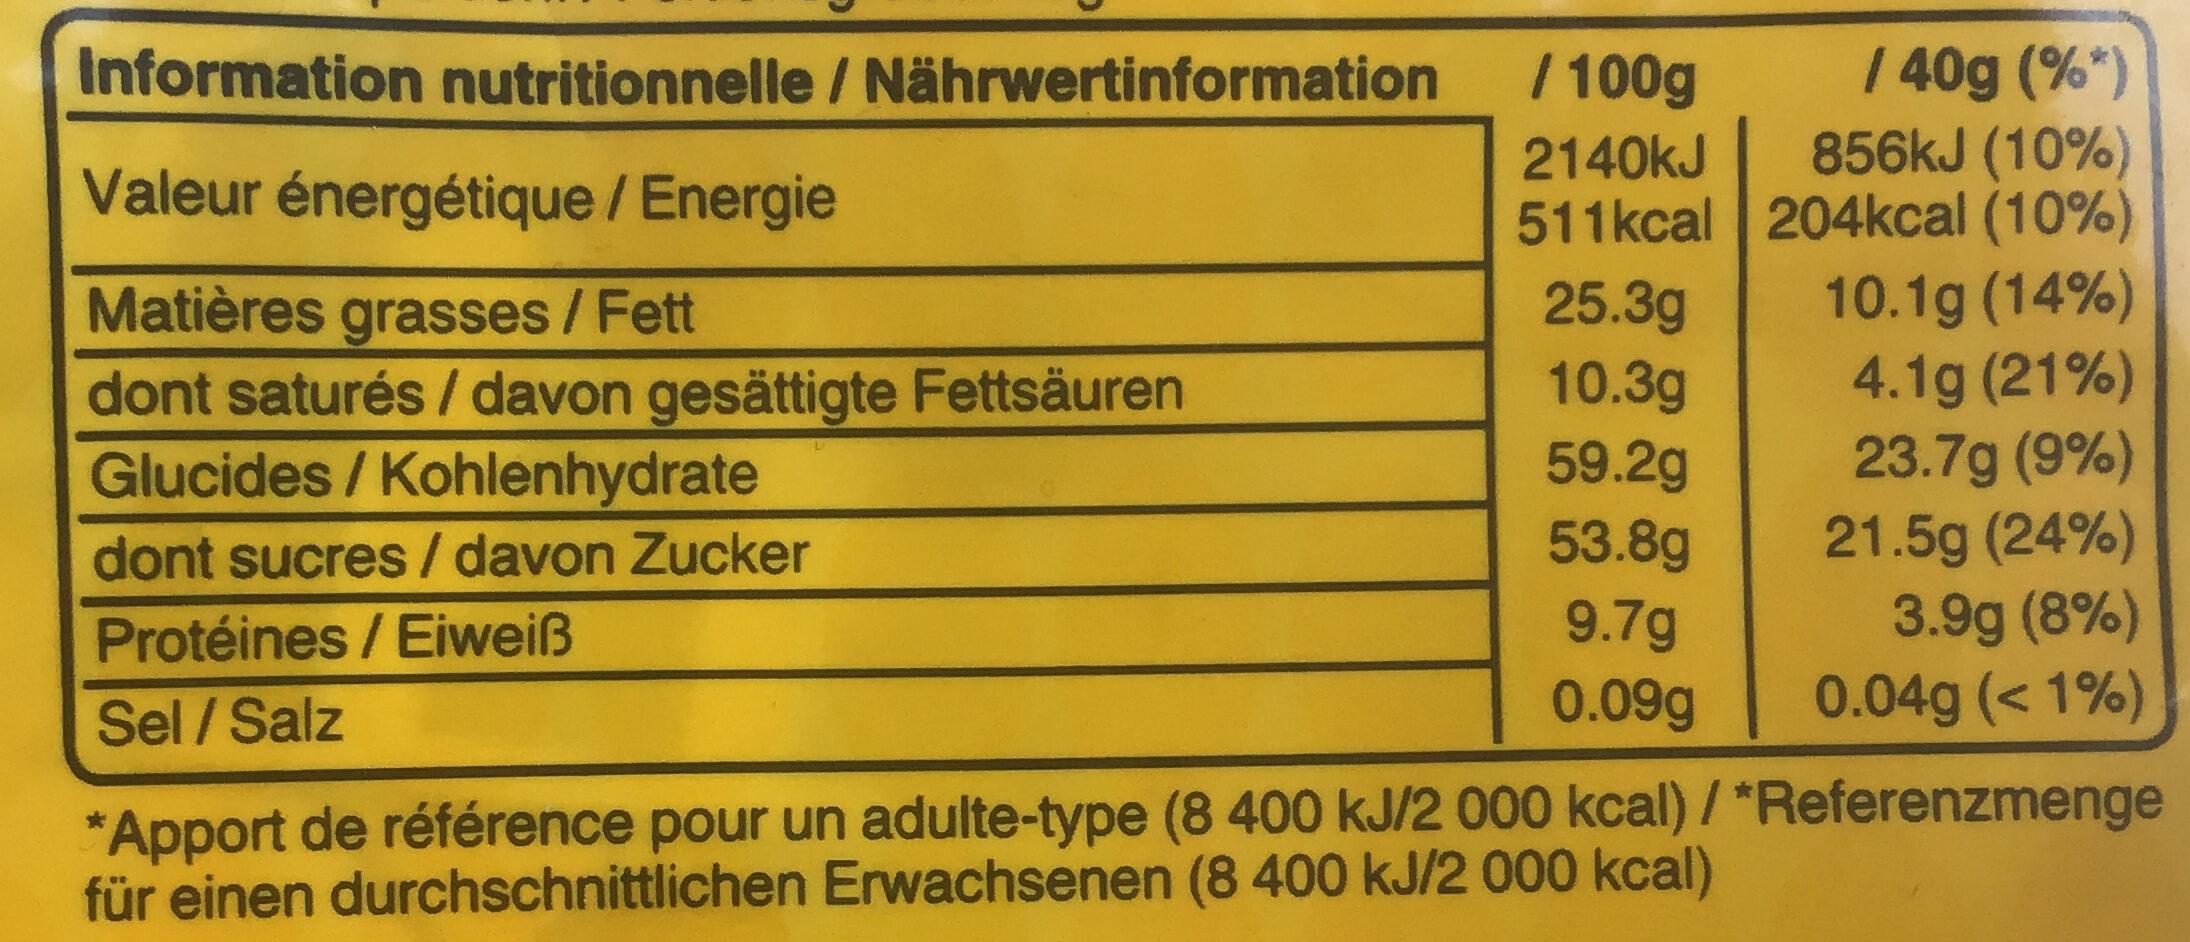 M&M's - Ingredients